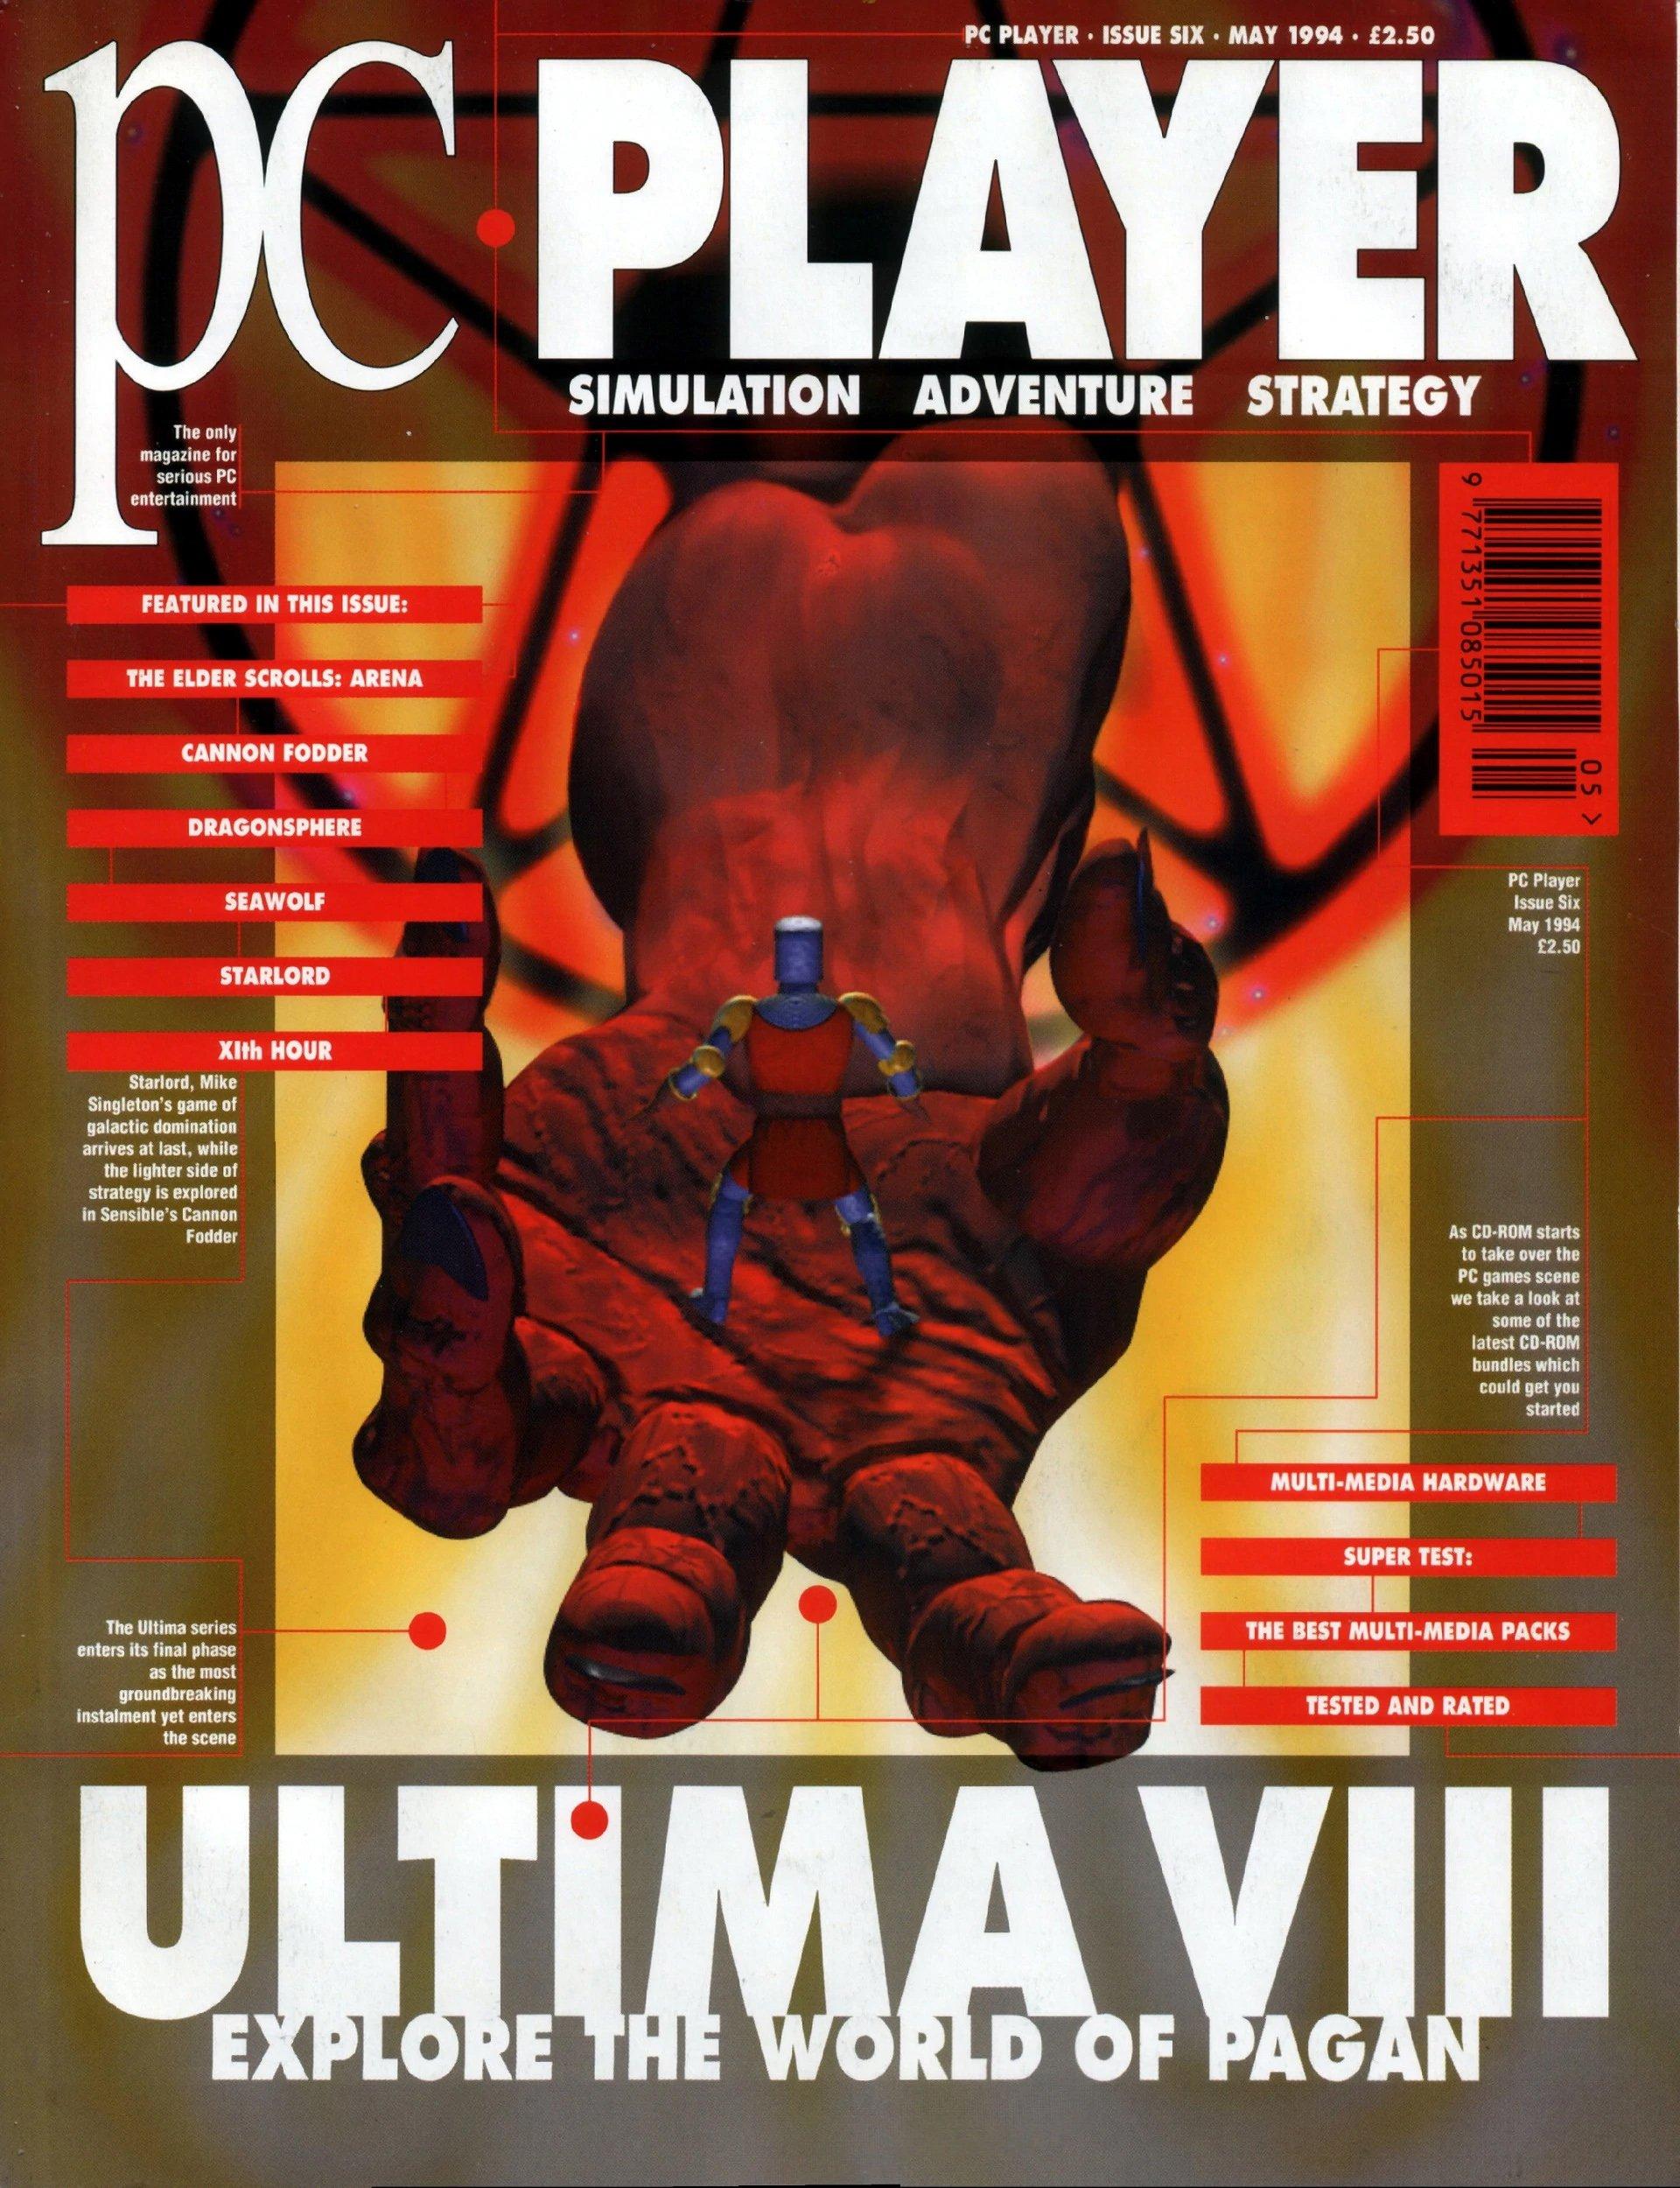 PC Player (Maverick Magazine) Issue 06 (May 1994)